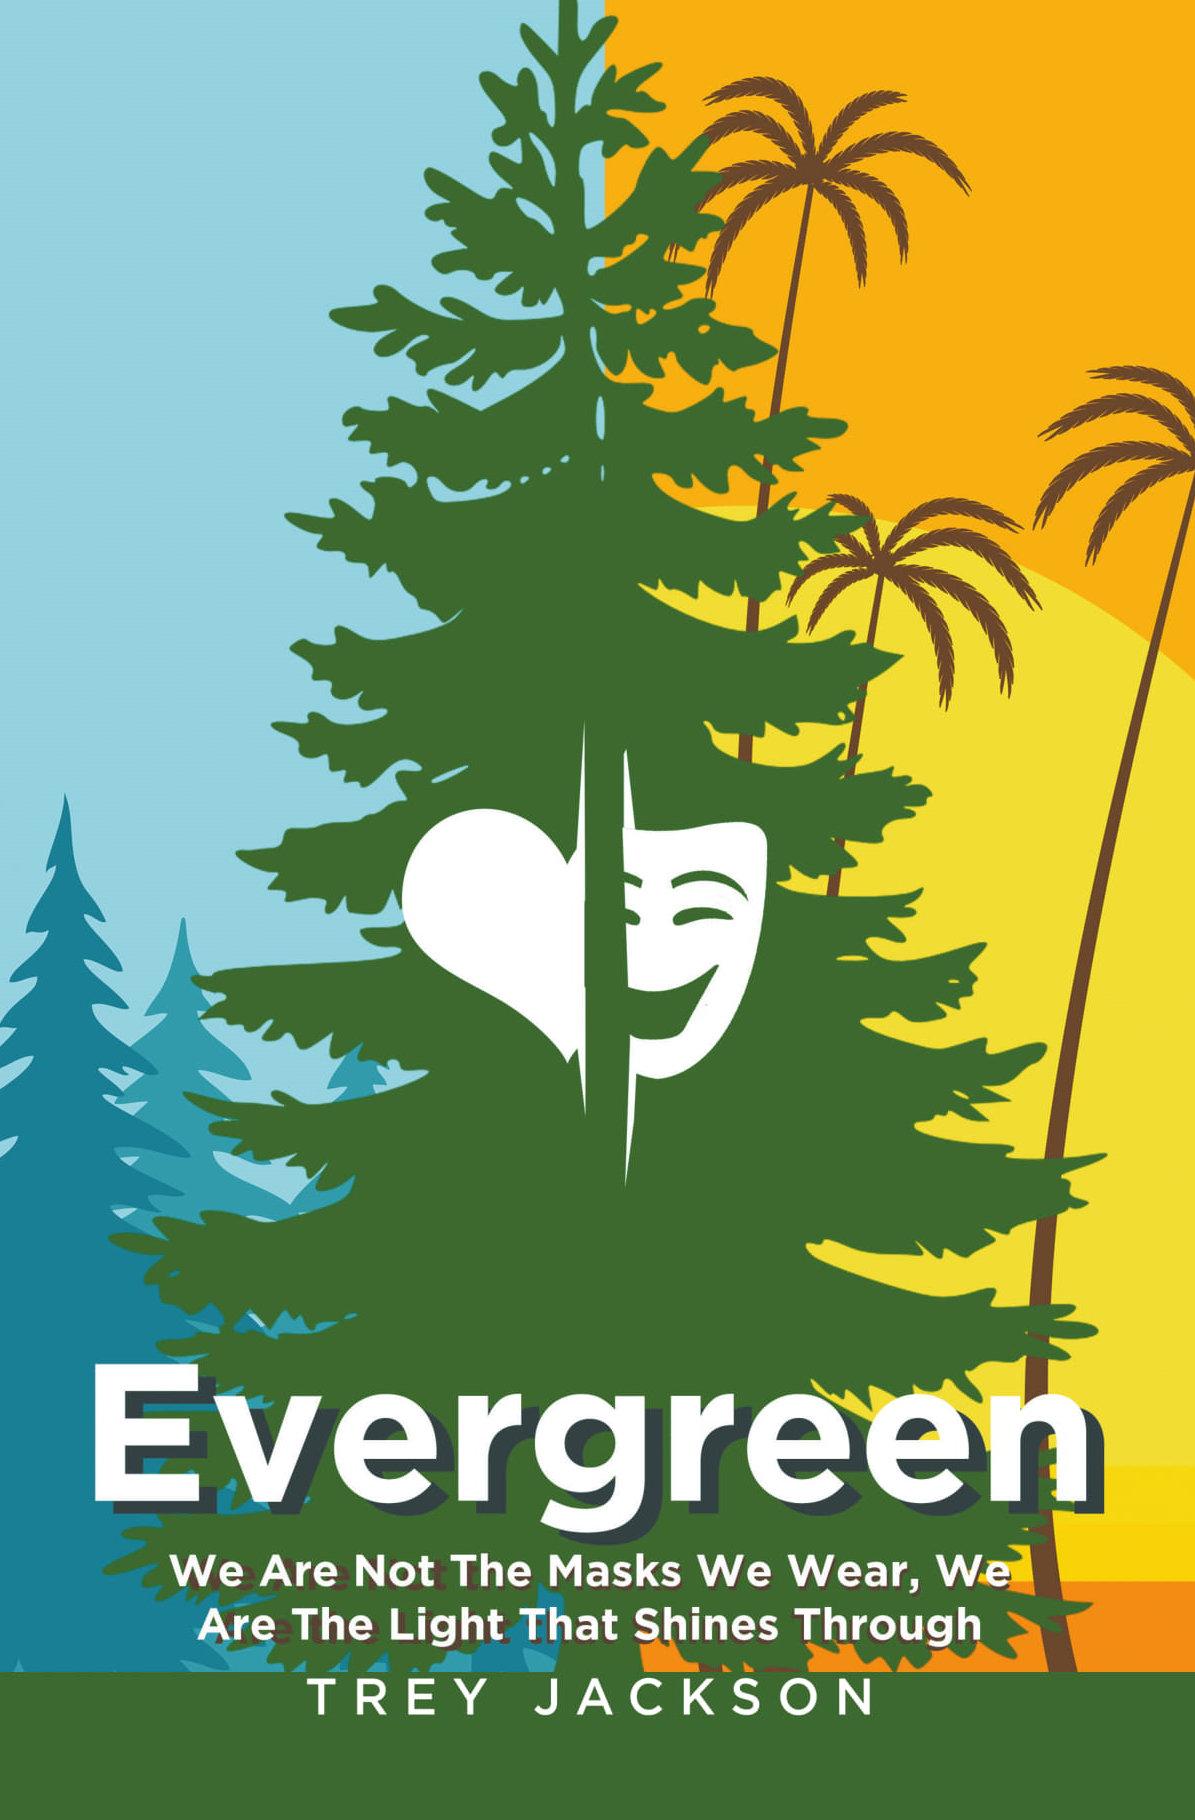 Trey Jackson - Evergreen